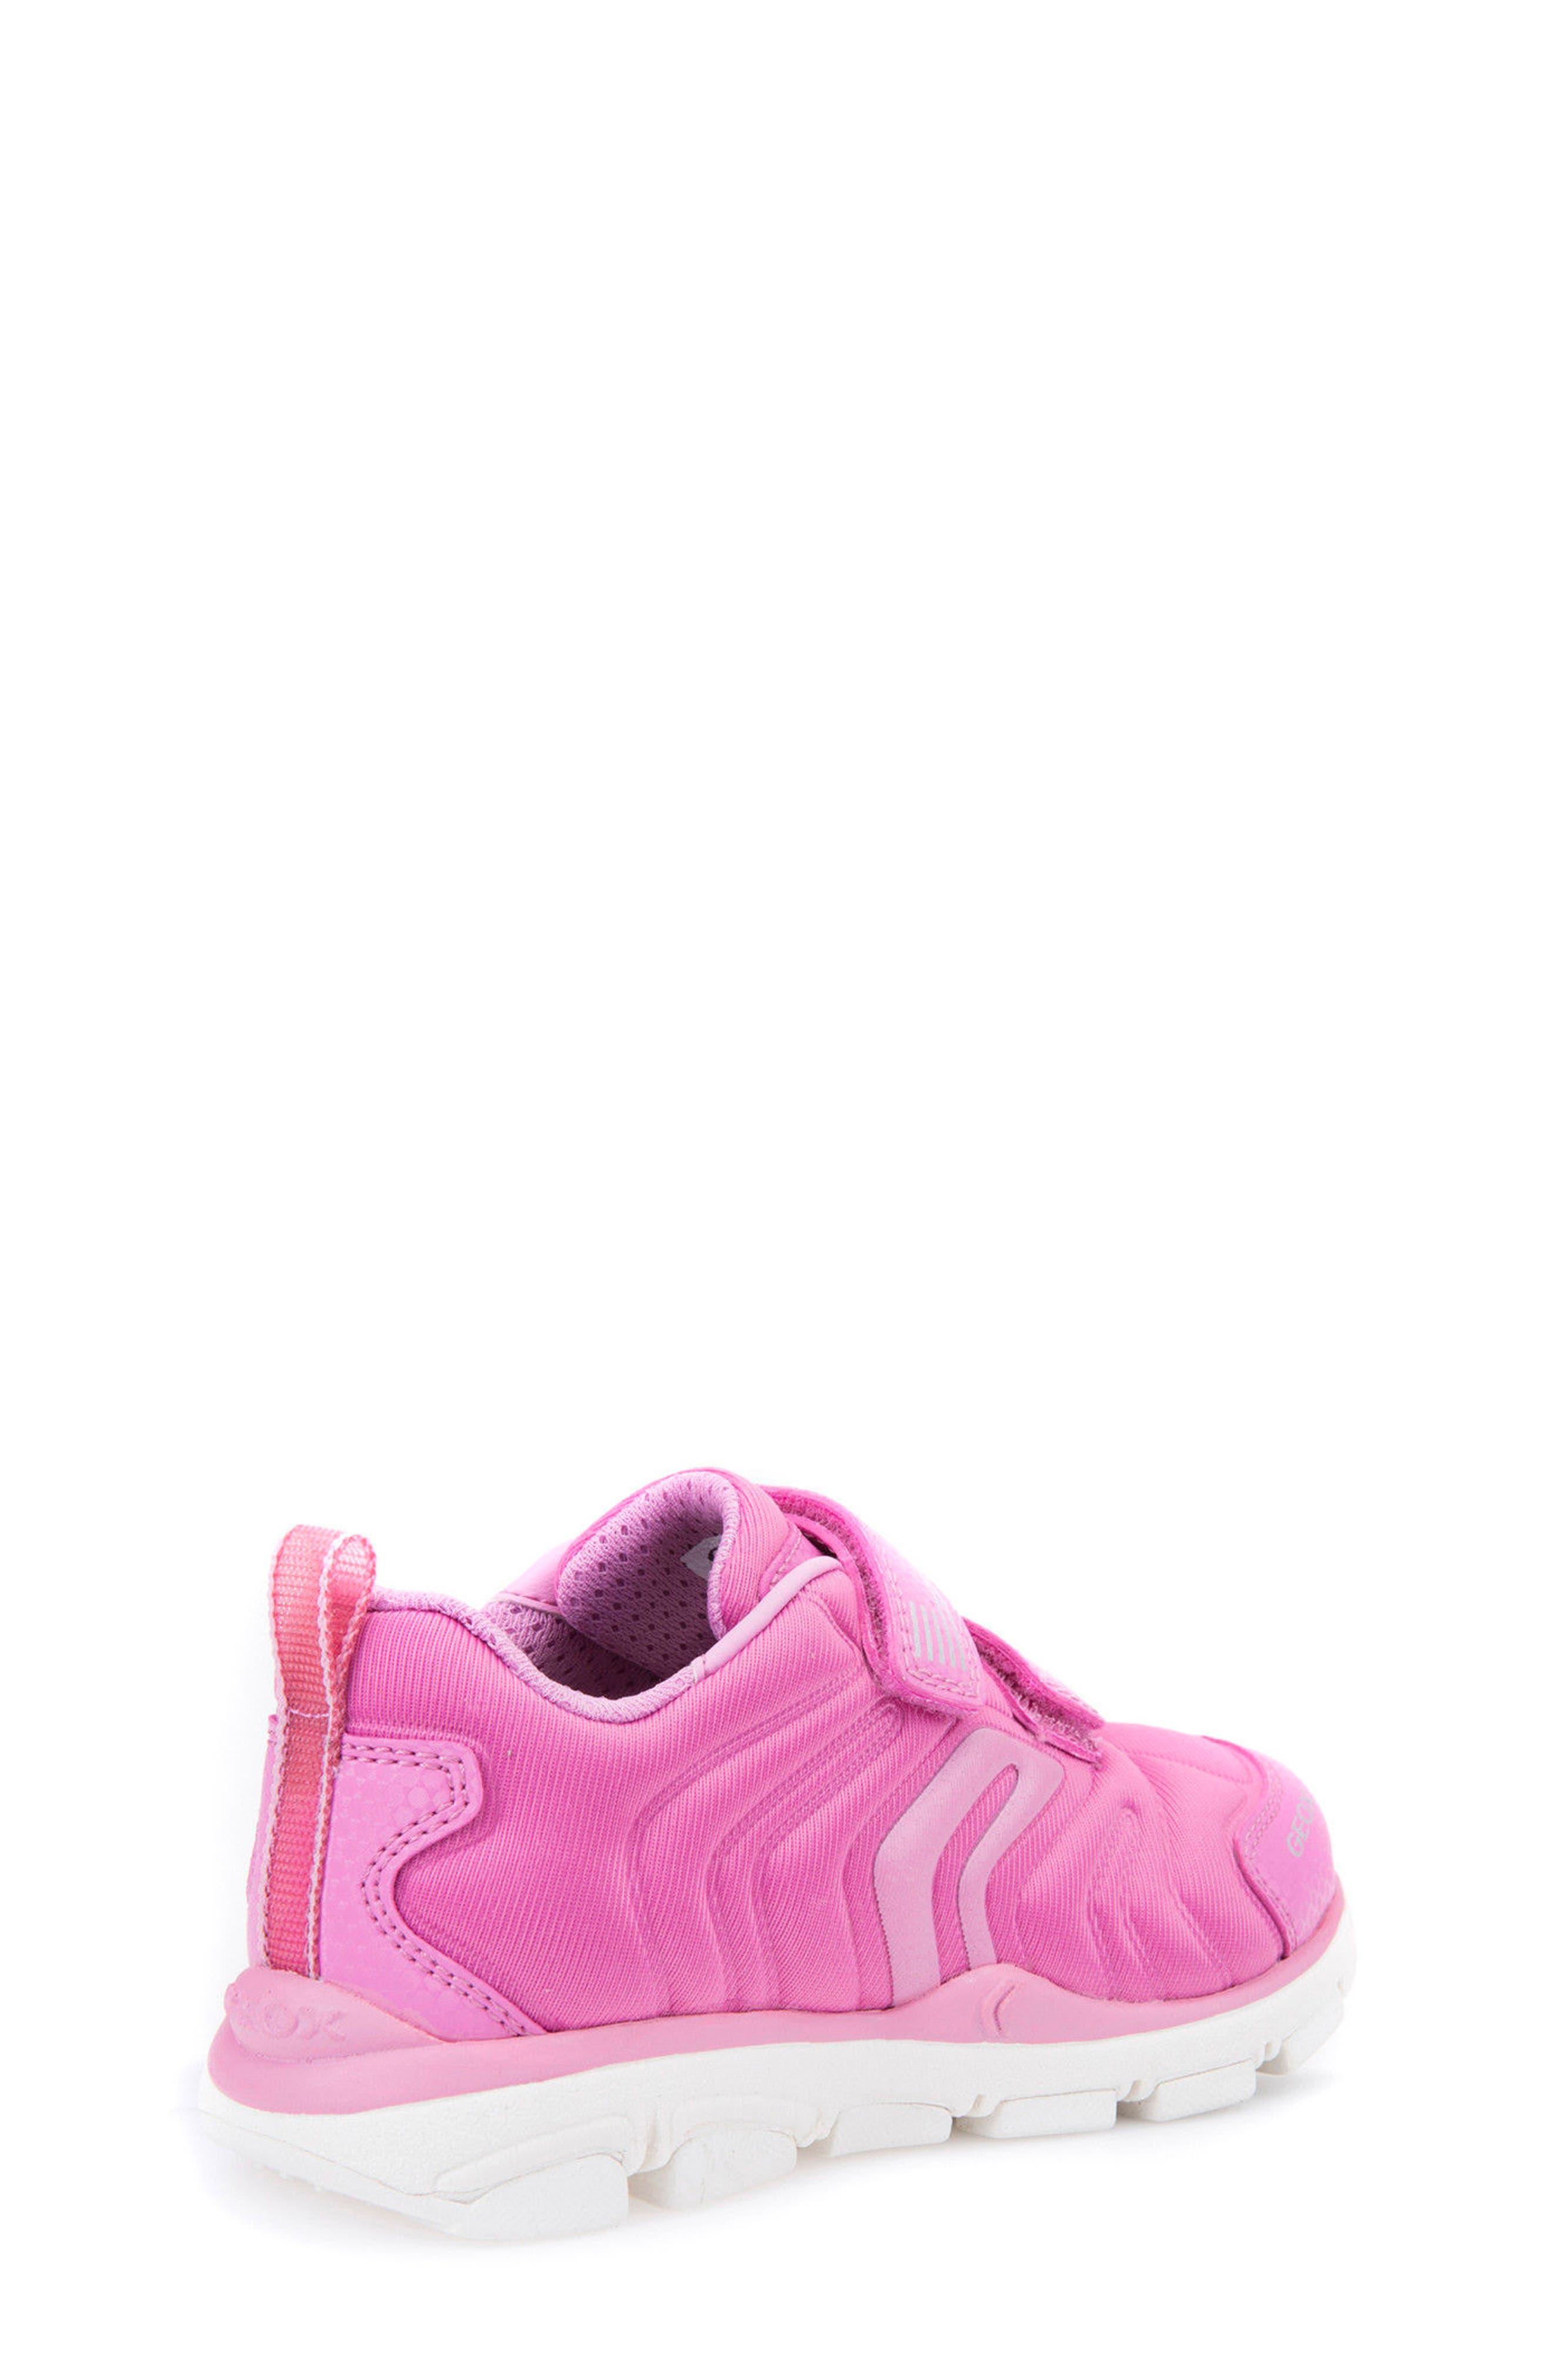 Torque Sneaker,                             Alternate thumbnail 2, color,                             660